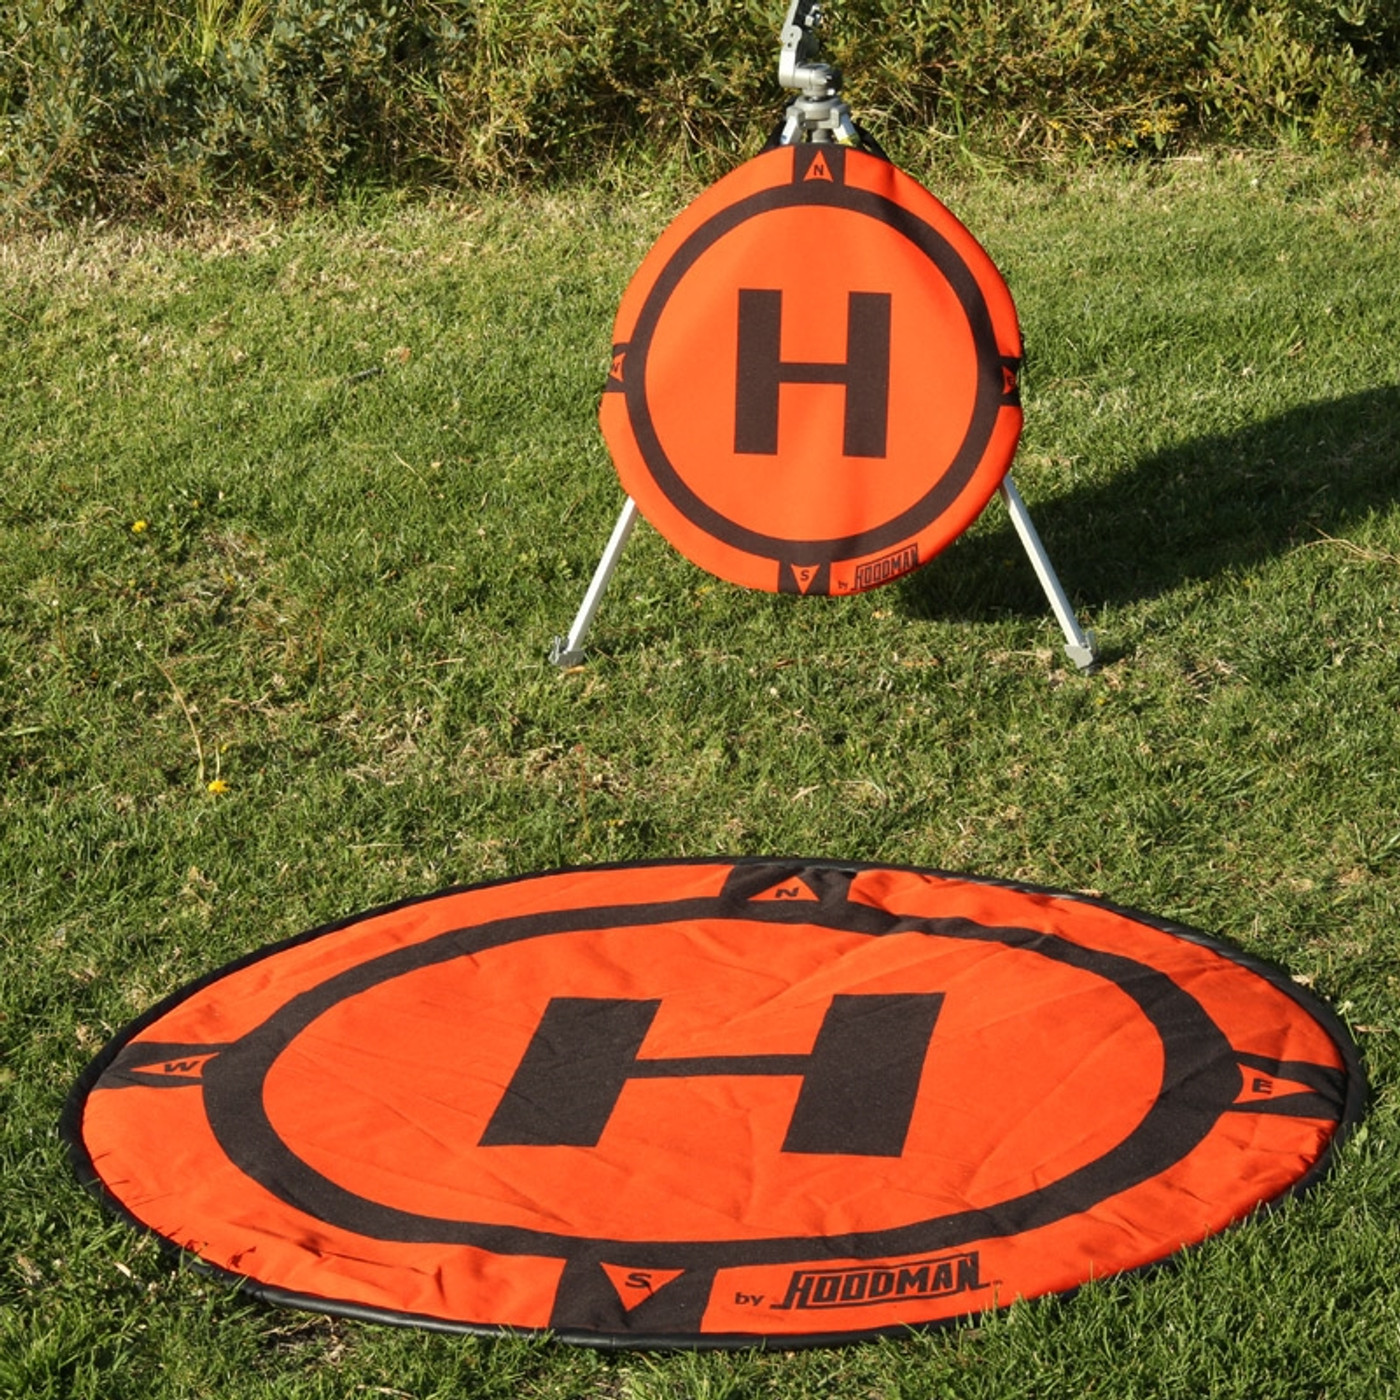 Hoodman 5 Ft. Diameter Drone Landing Pad